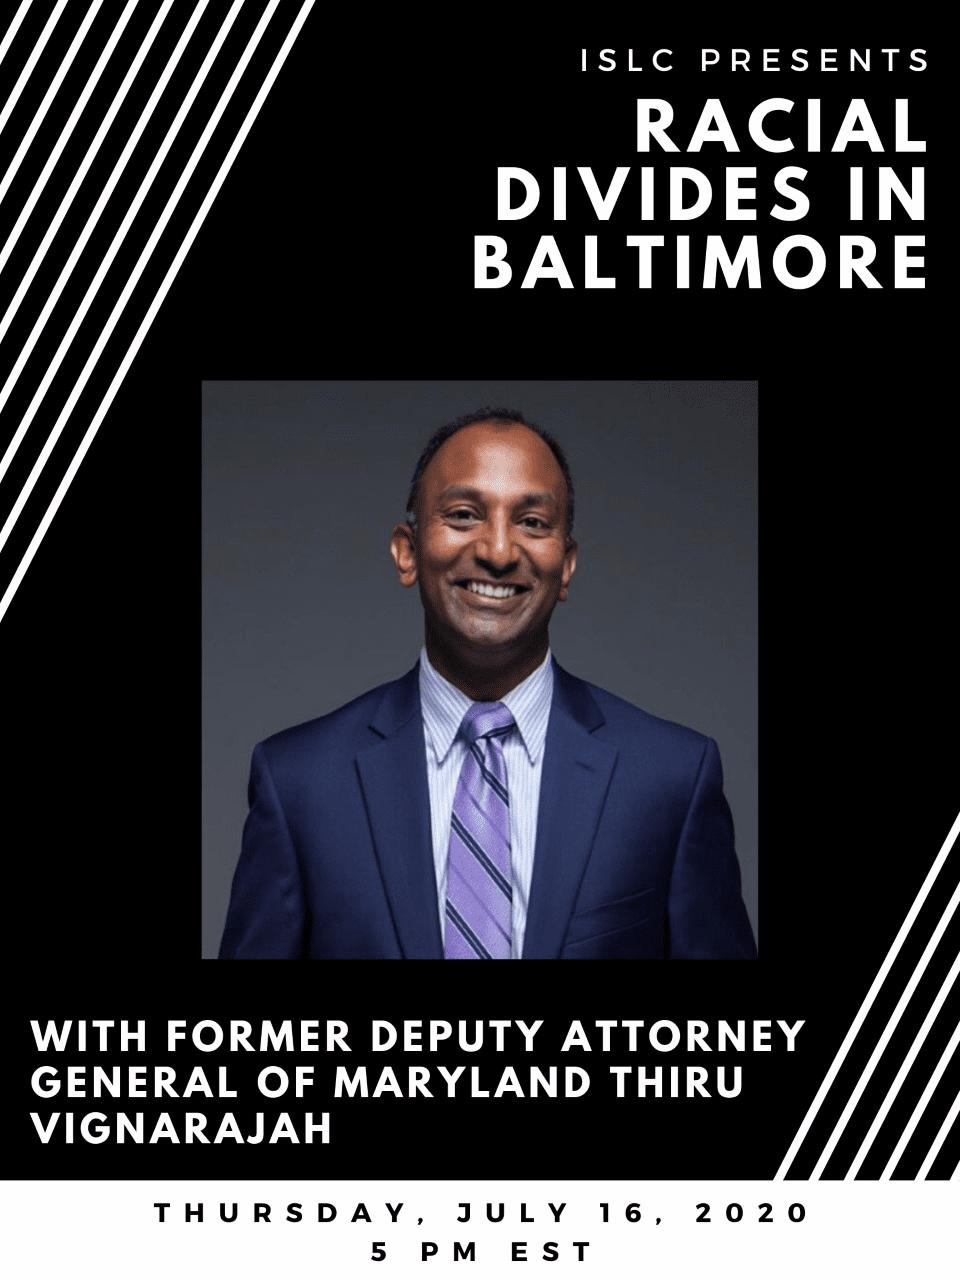 ISLC Summer Speaker Series: Racial Divides in Baltimore